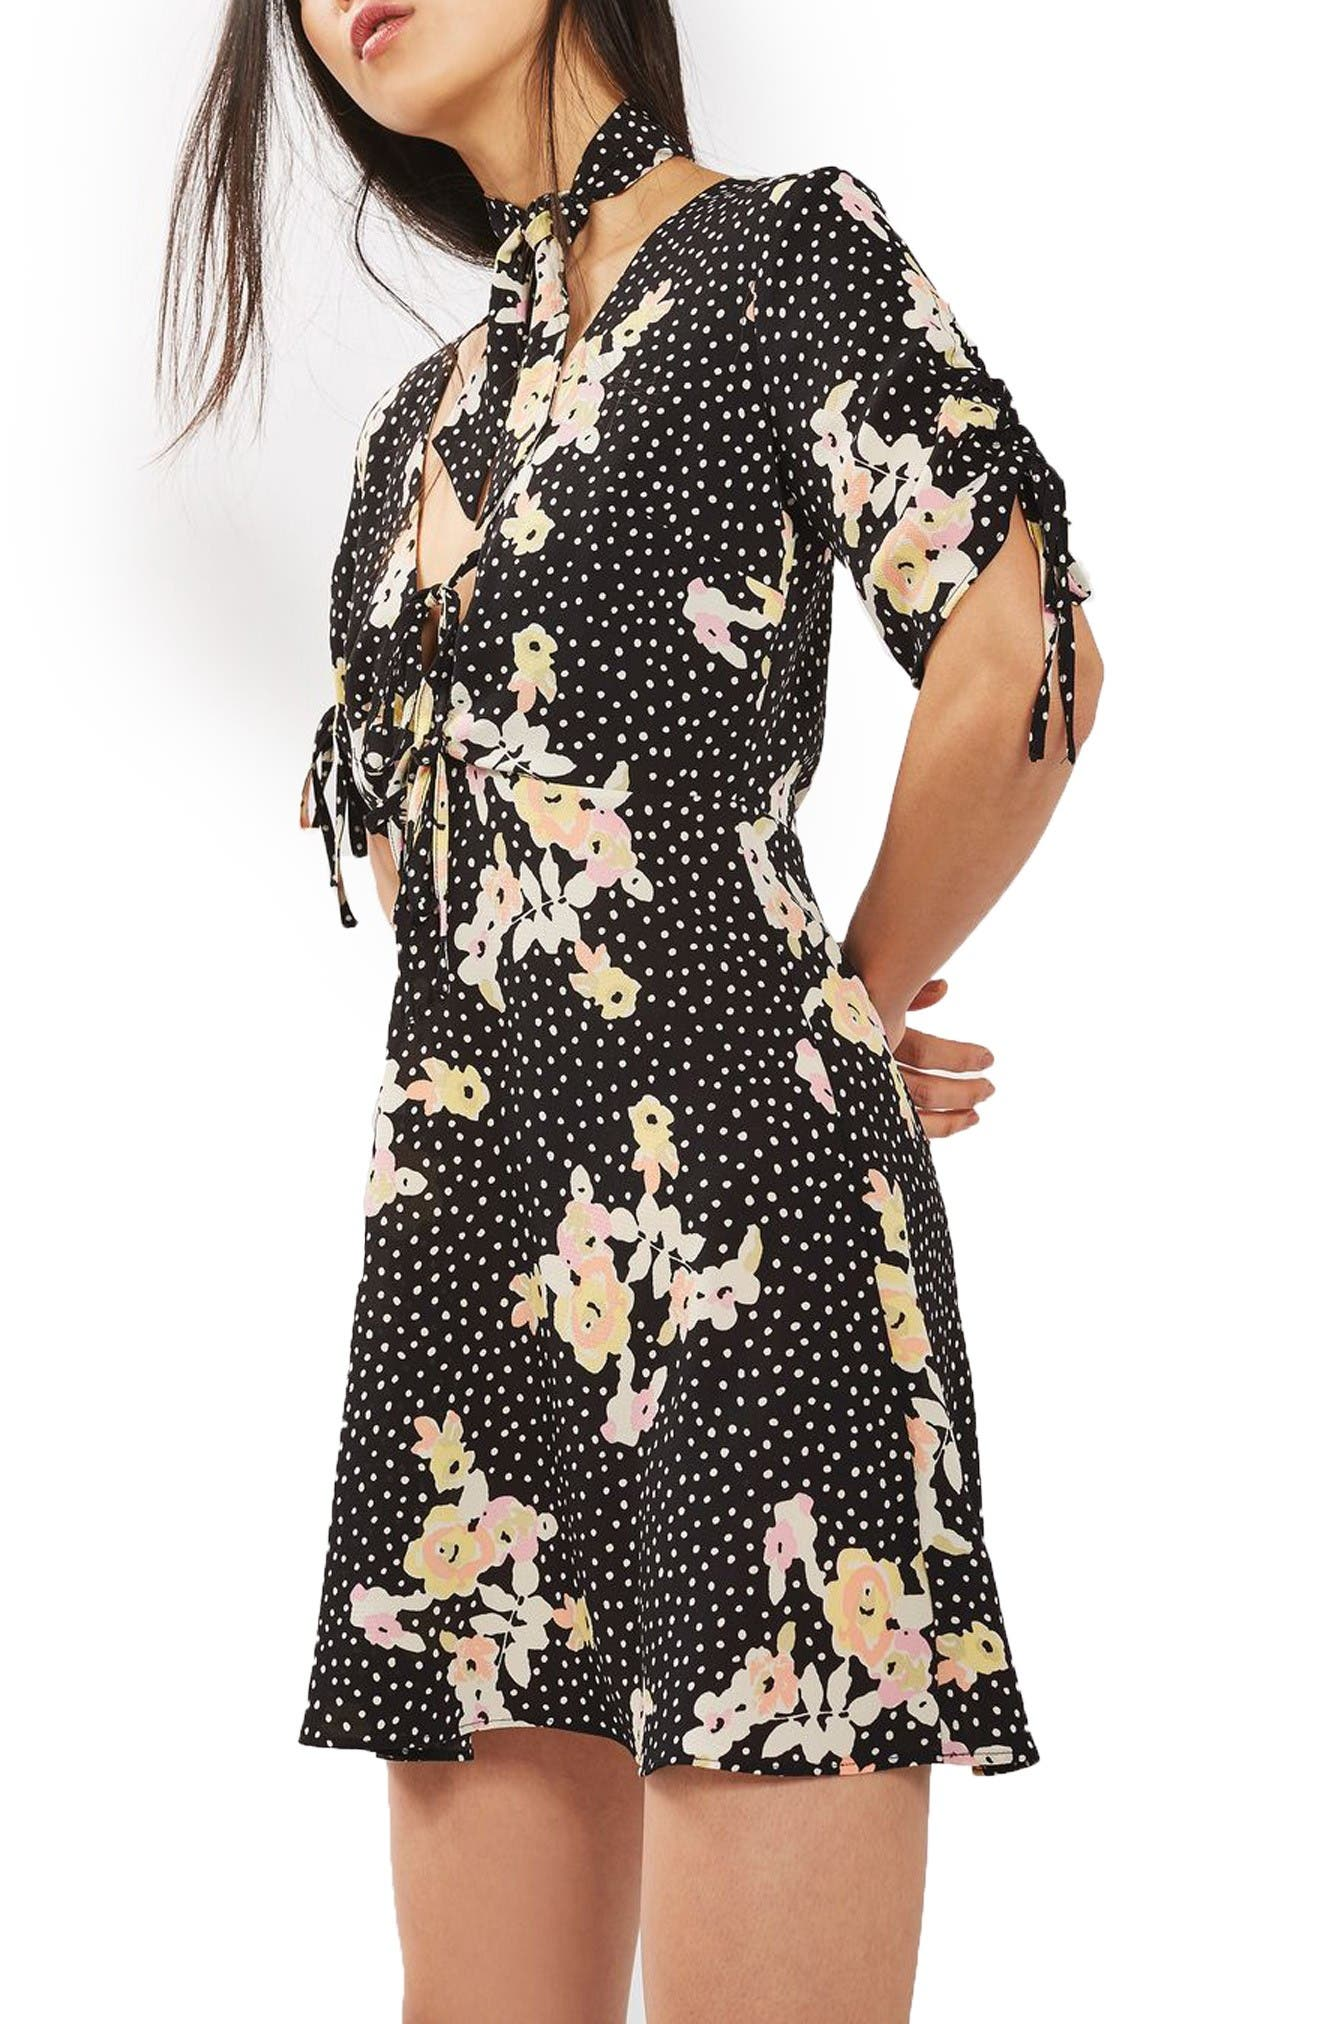 Topshop Floral Spot Tie Tea Dress (Regular & Petite)